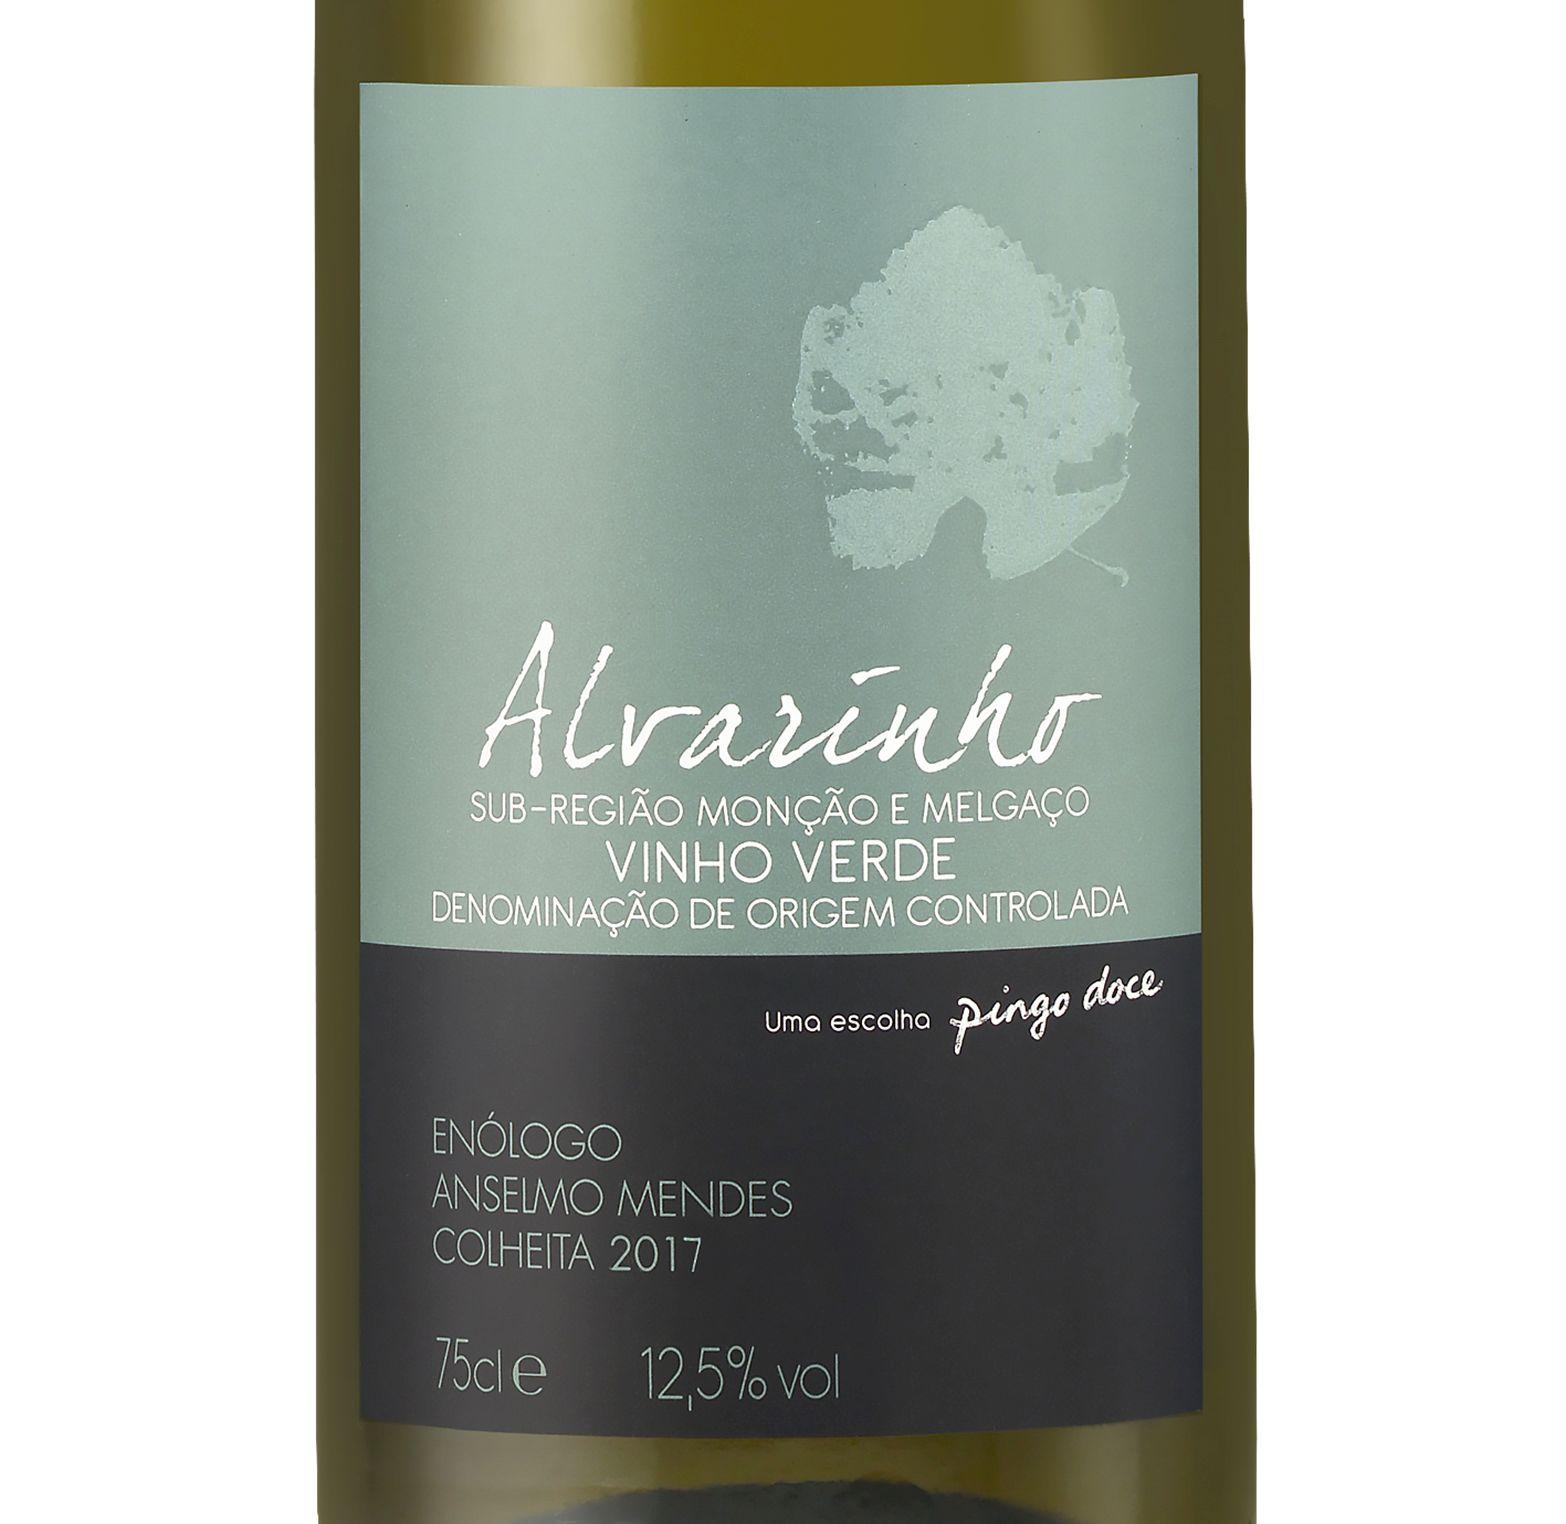 Vinho Verde Alvarinho Branco Pingo Doce 75cl-2017 (1)